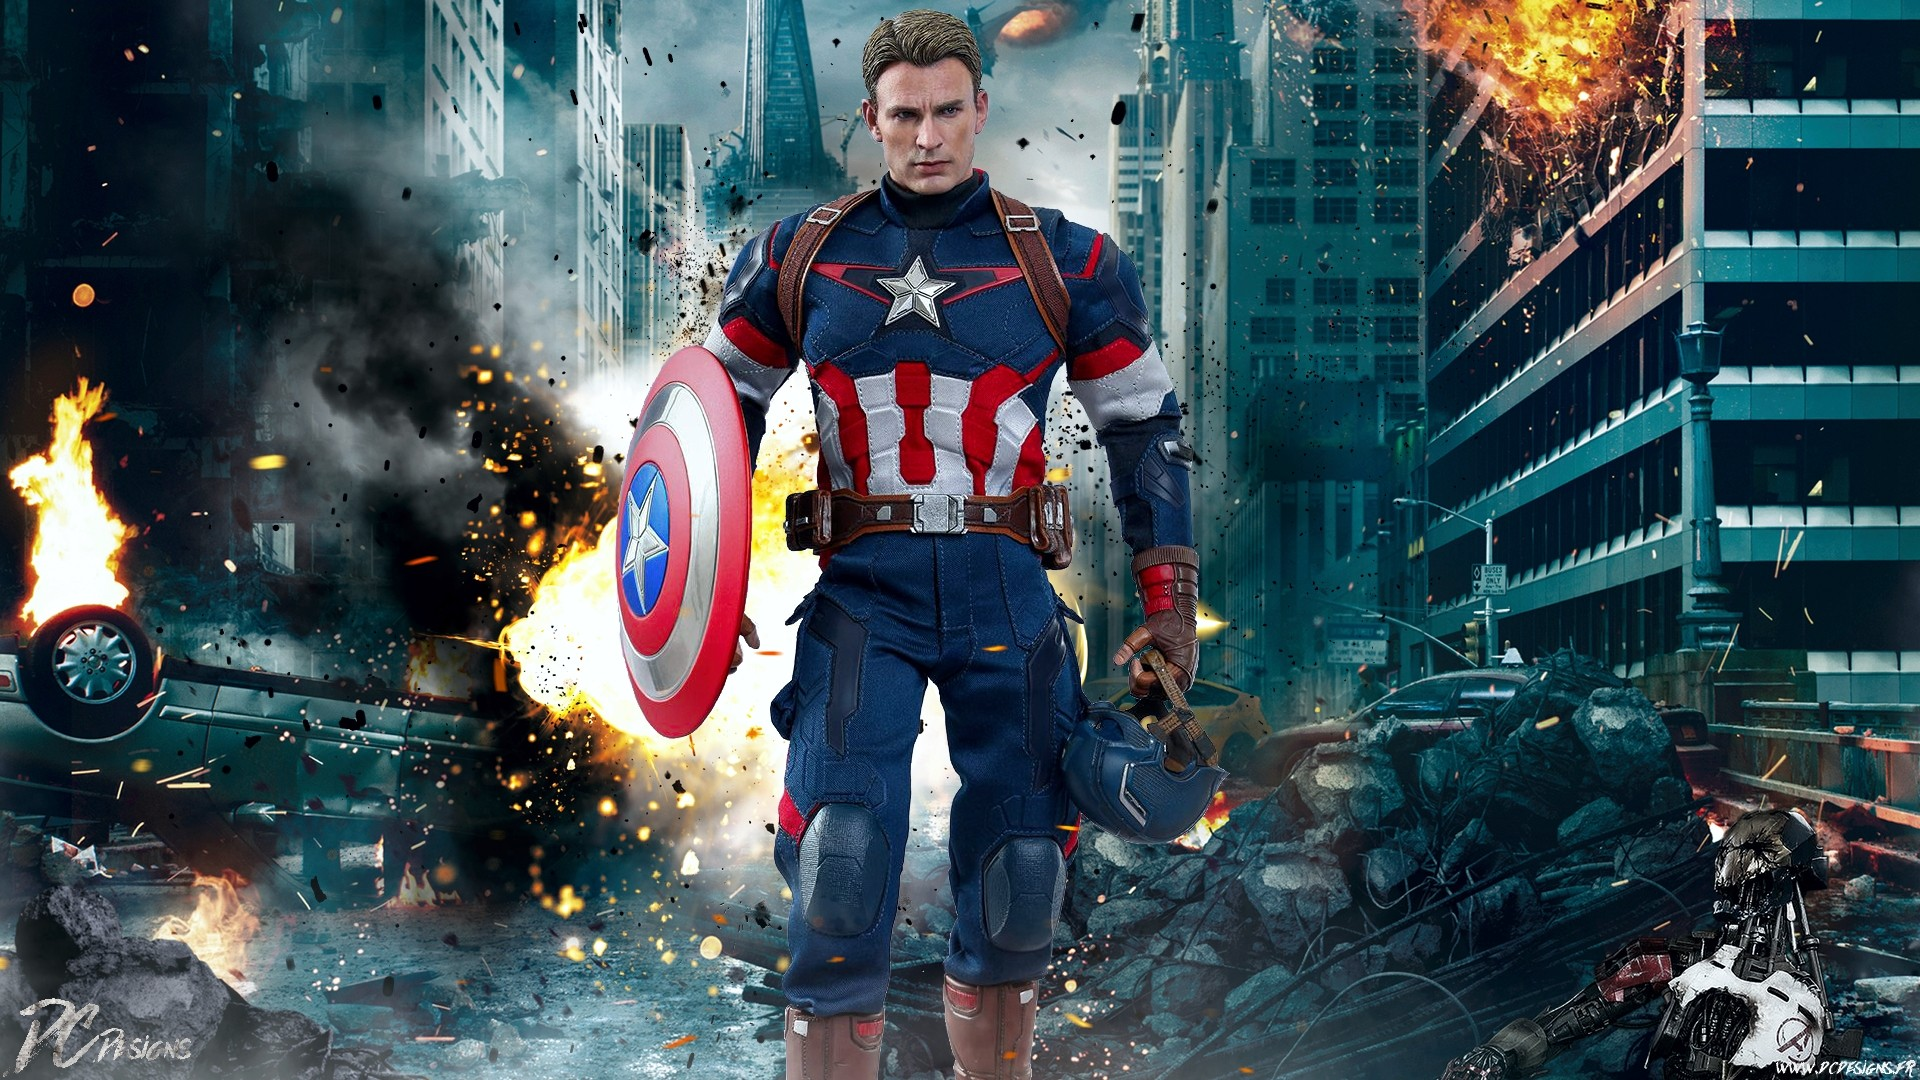 Captain America wallpaper photo